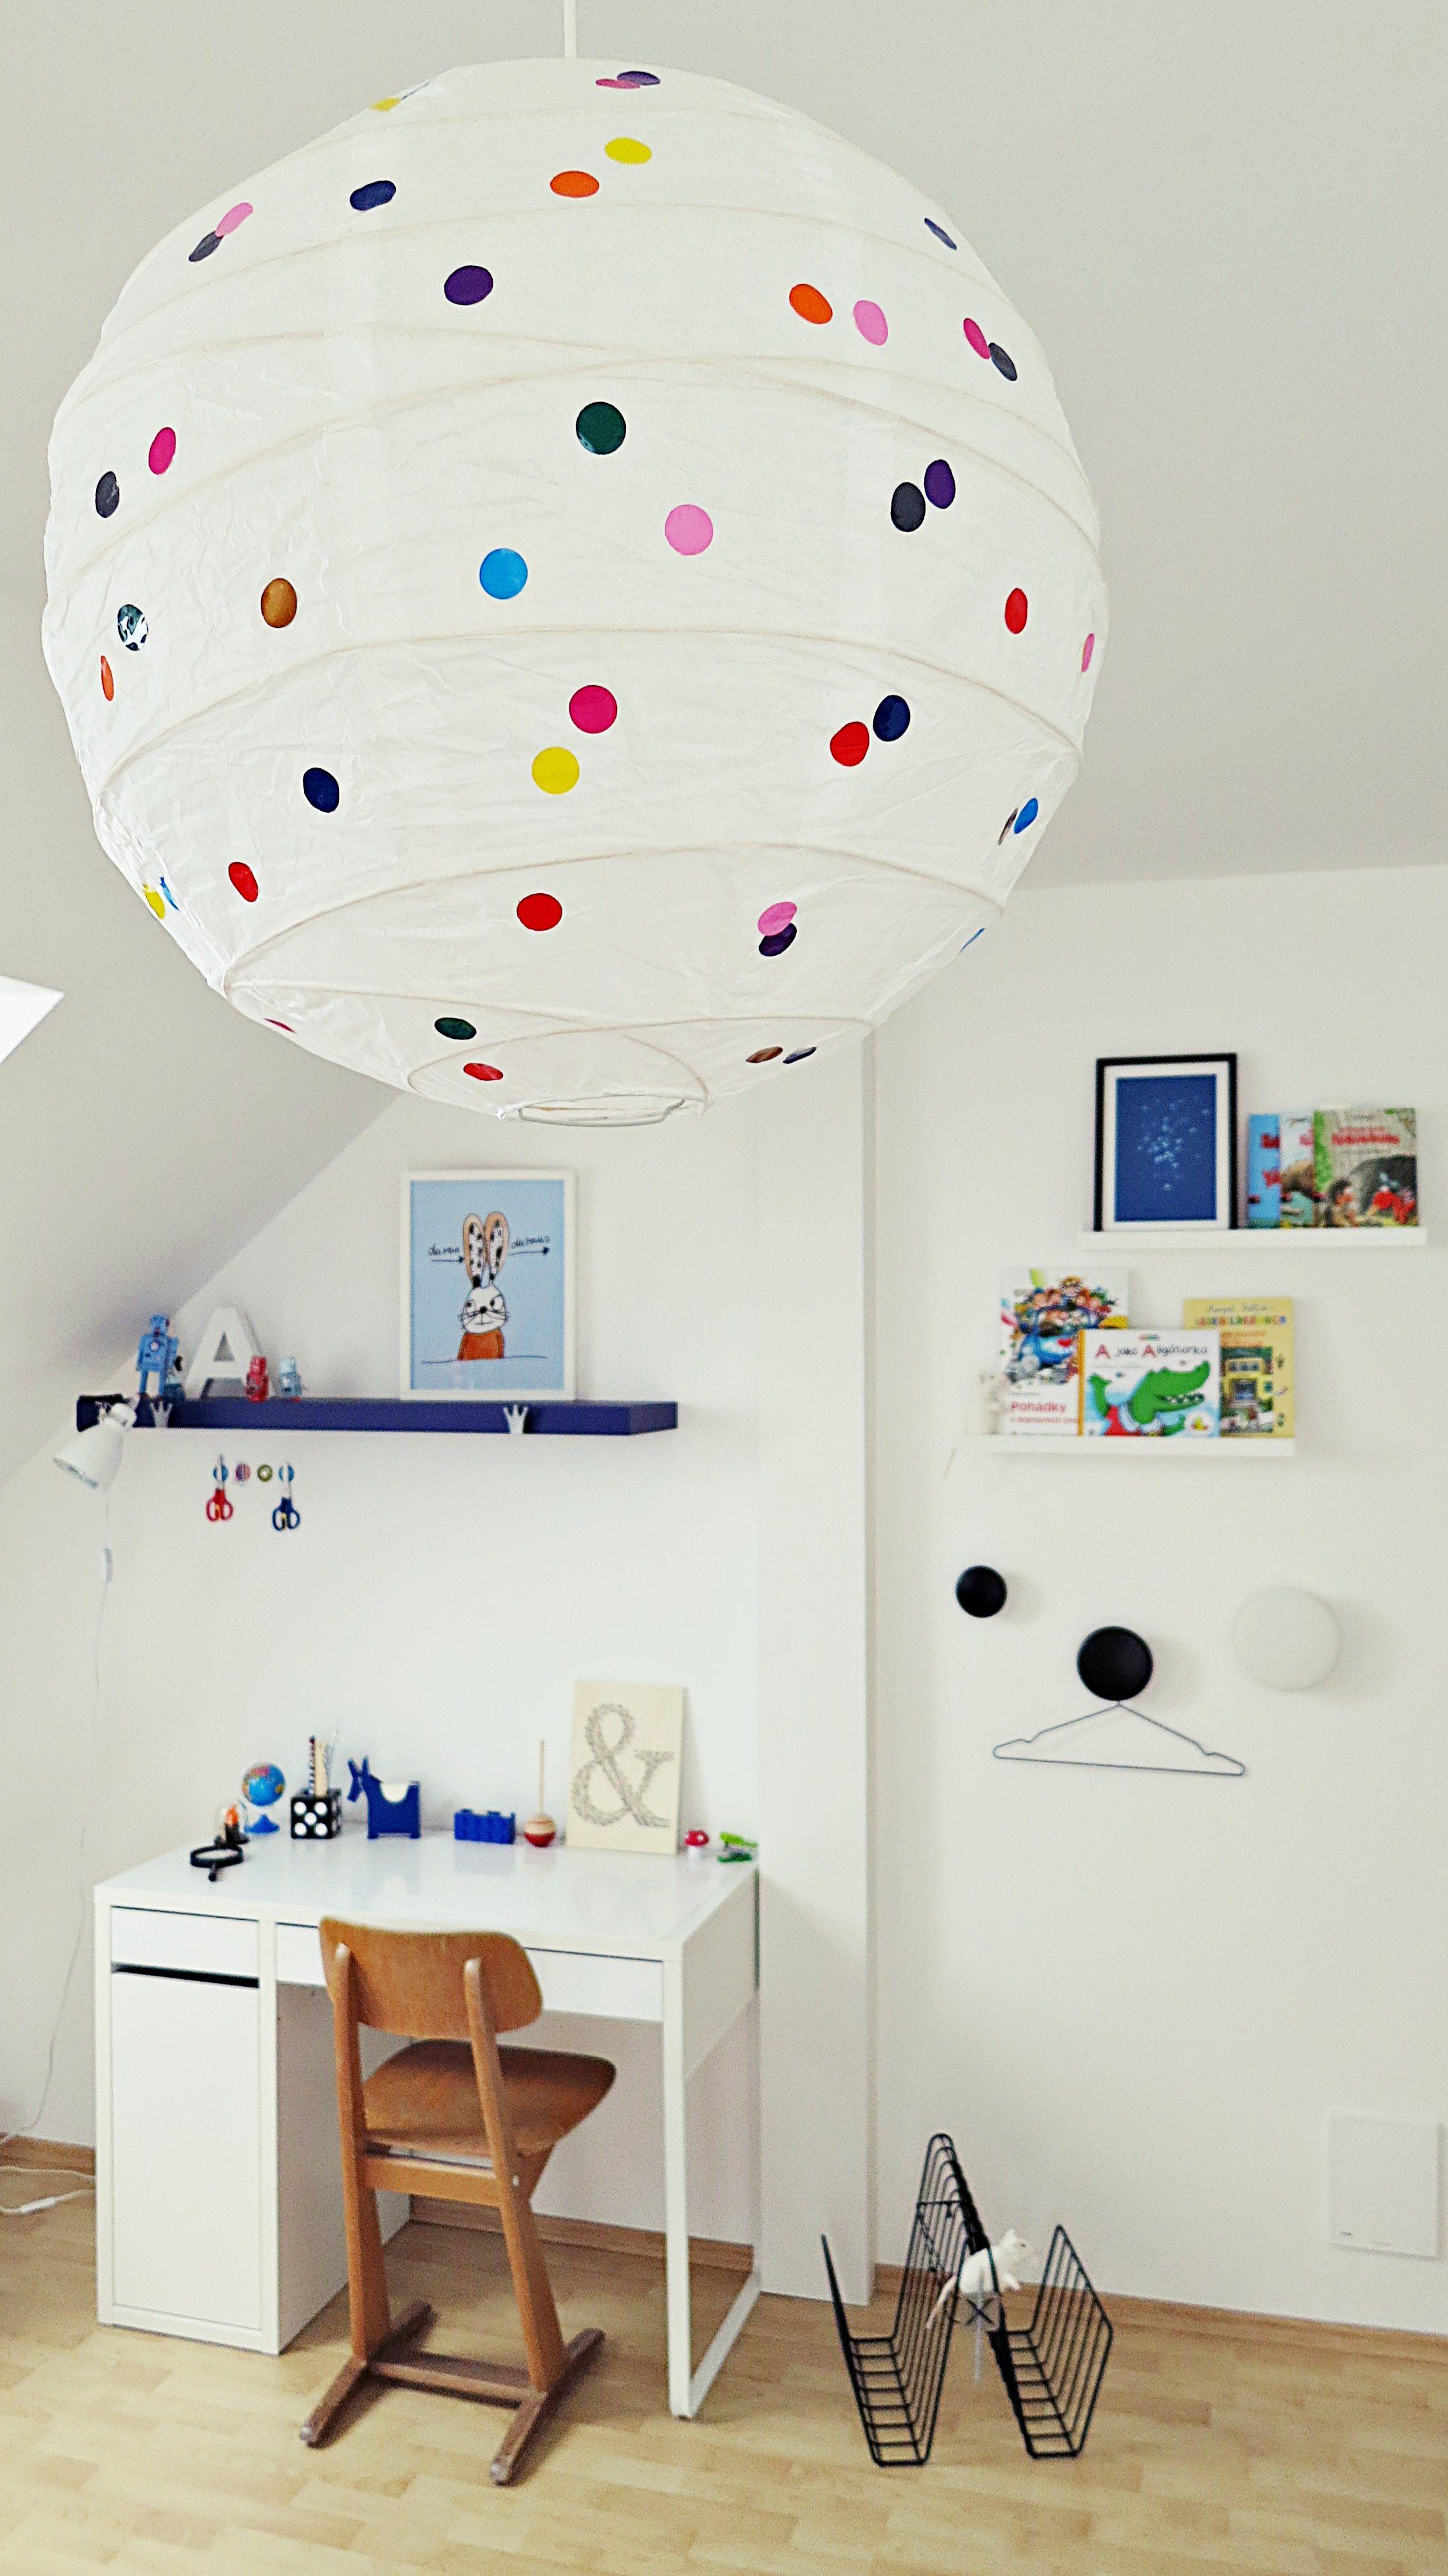 Übergangslösung | Room, Babies and Kids rooms